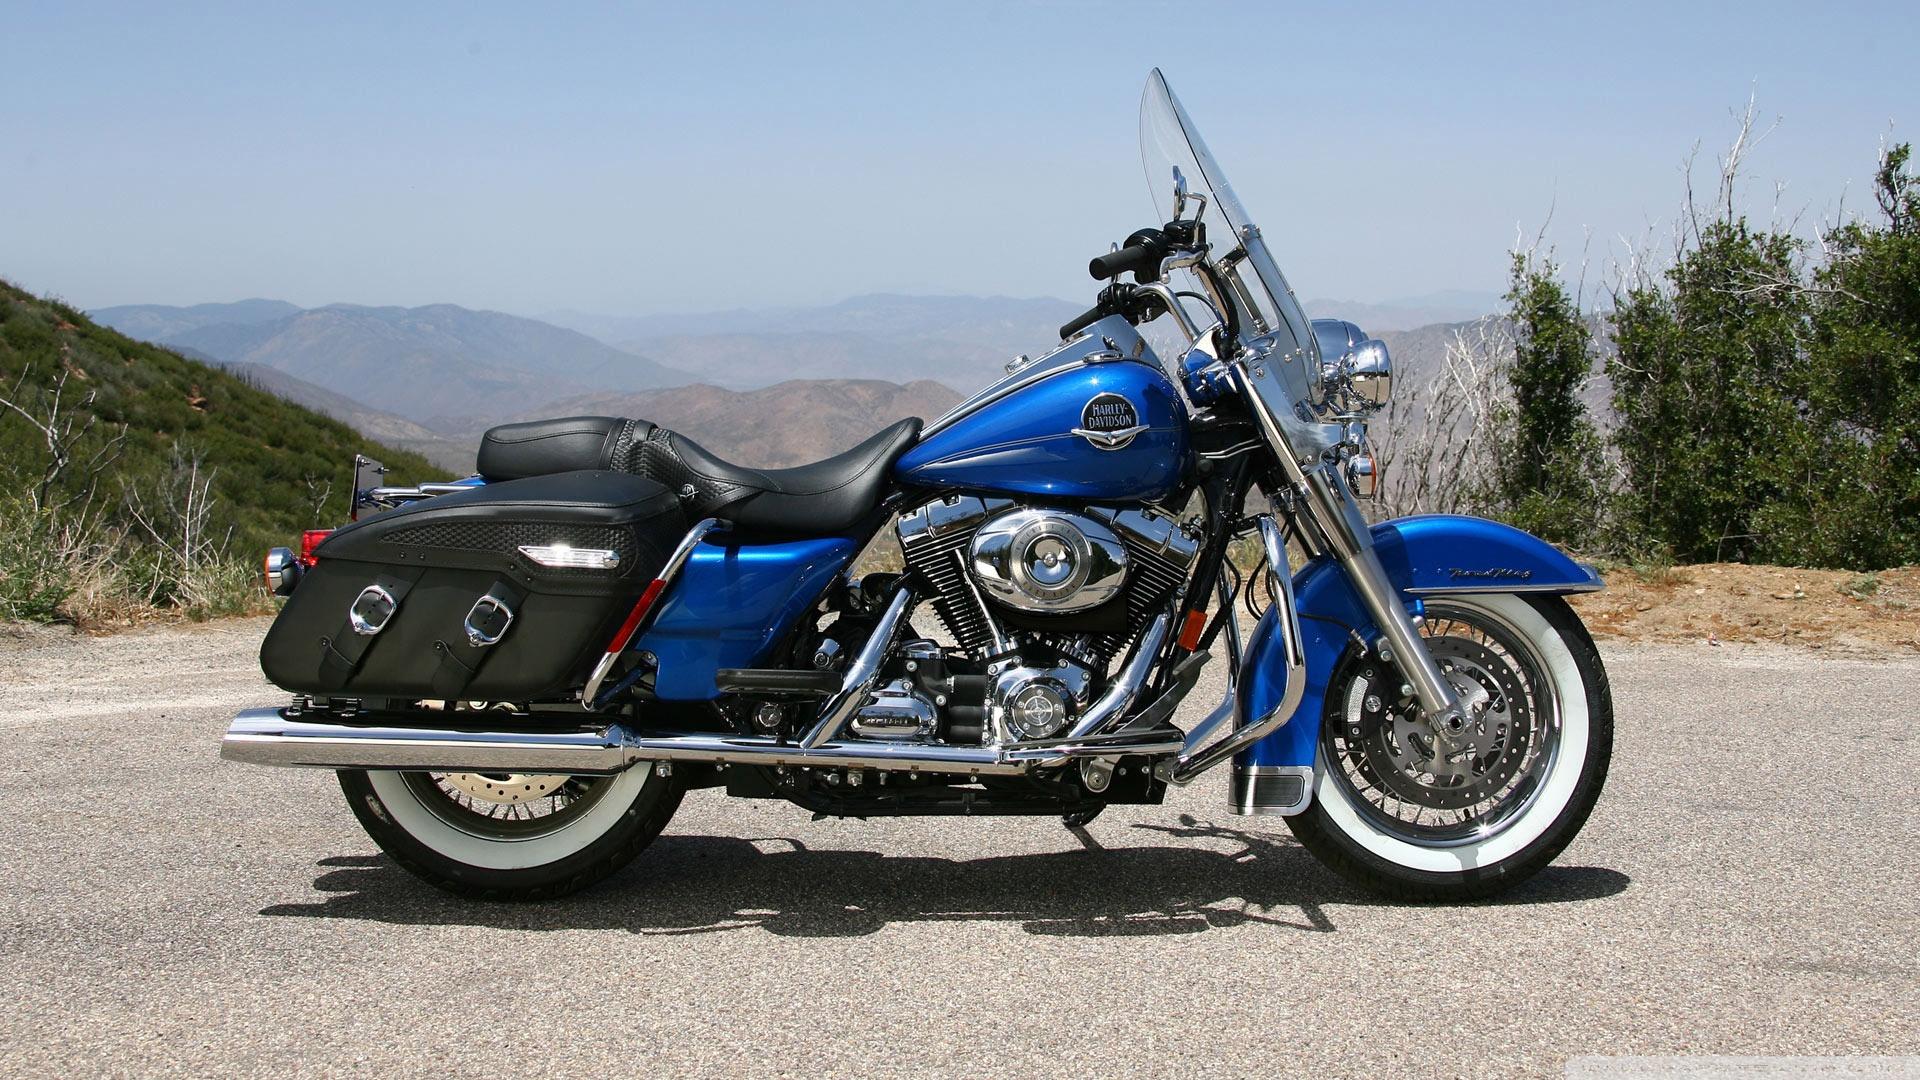 Harley Davidson Bikes wallpaper   835660 1920x1080